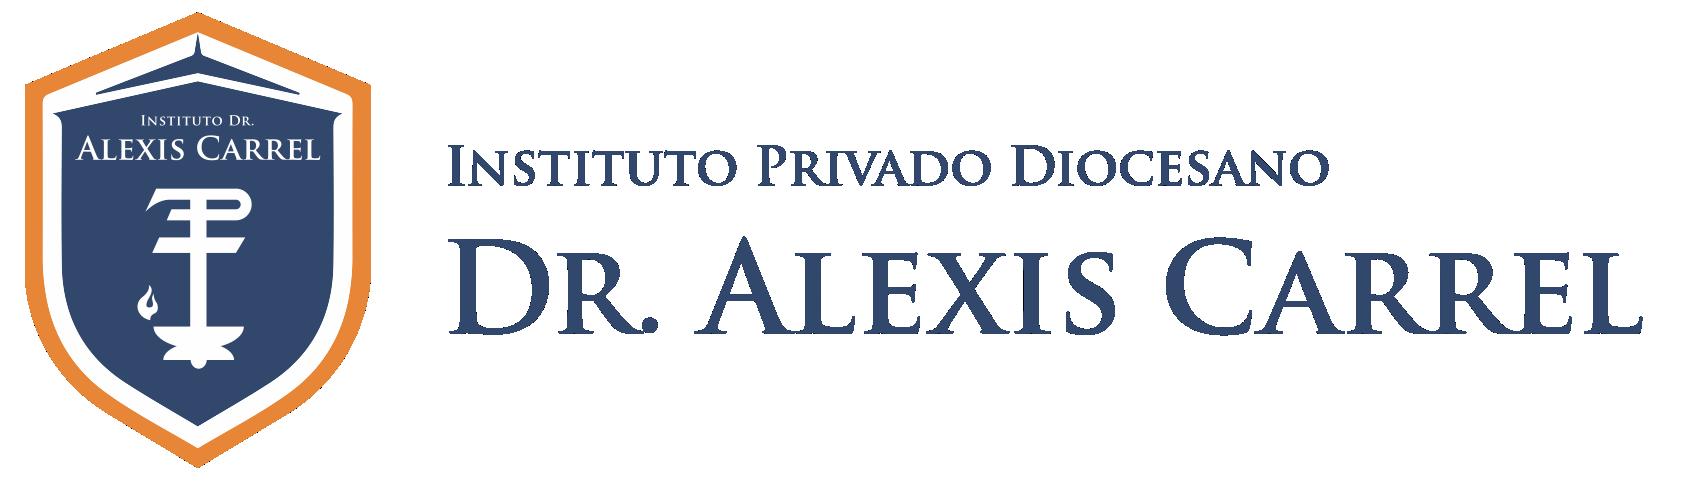 INSTITUTO PRIVADO DR. ALEXIS CARREL NIVEL SUPERIOR